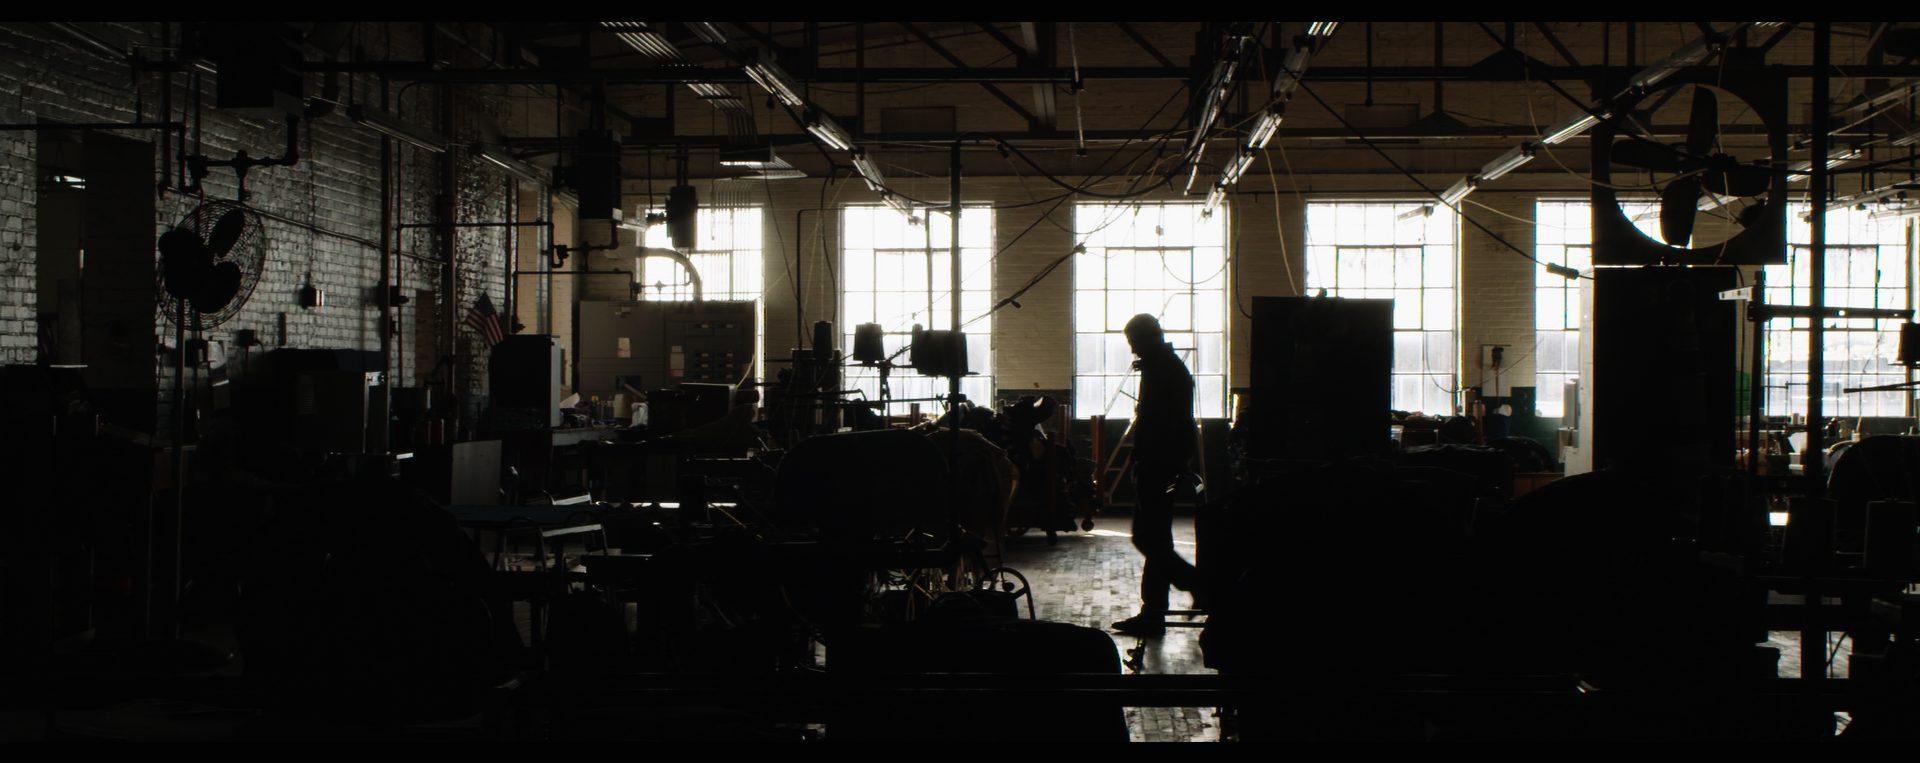 Actor Ryan O'Quinn walks through the deserted warehouse set.